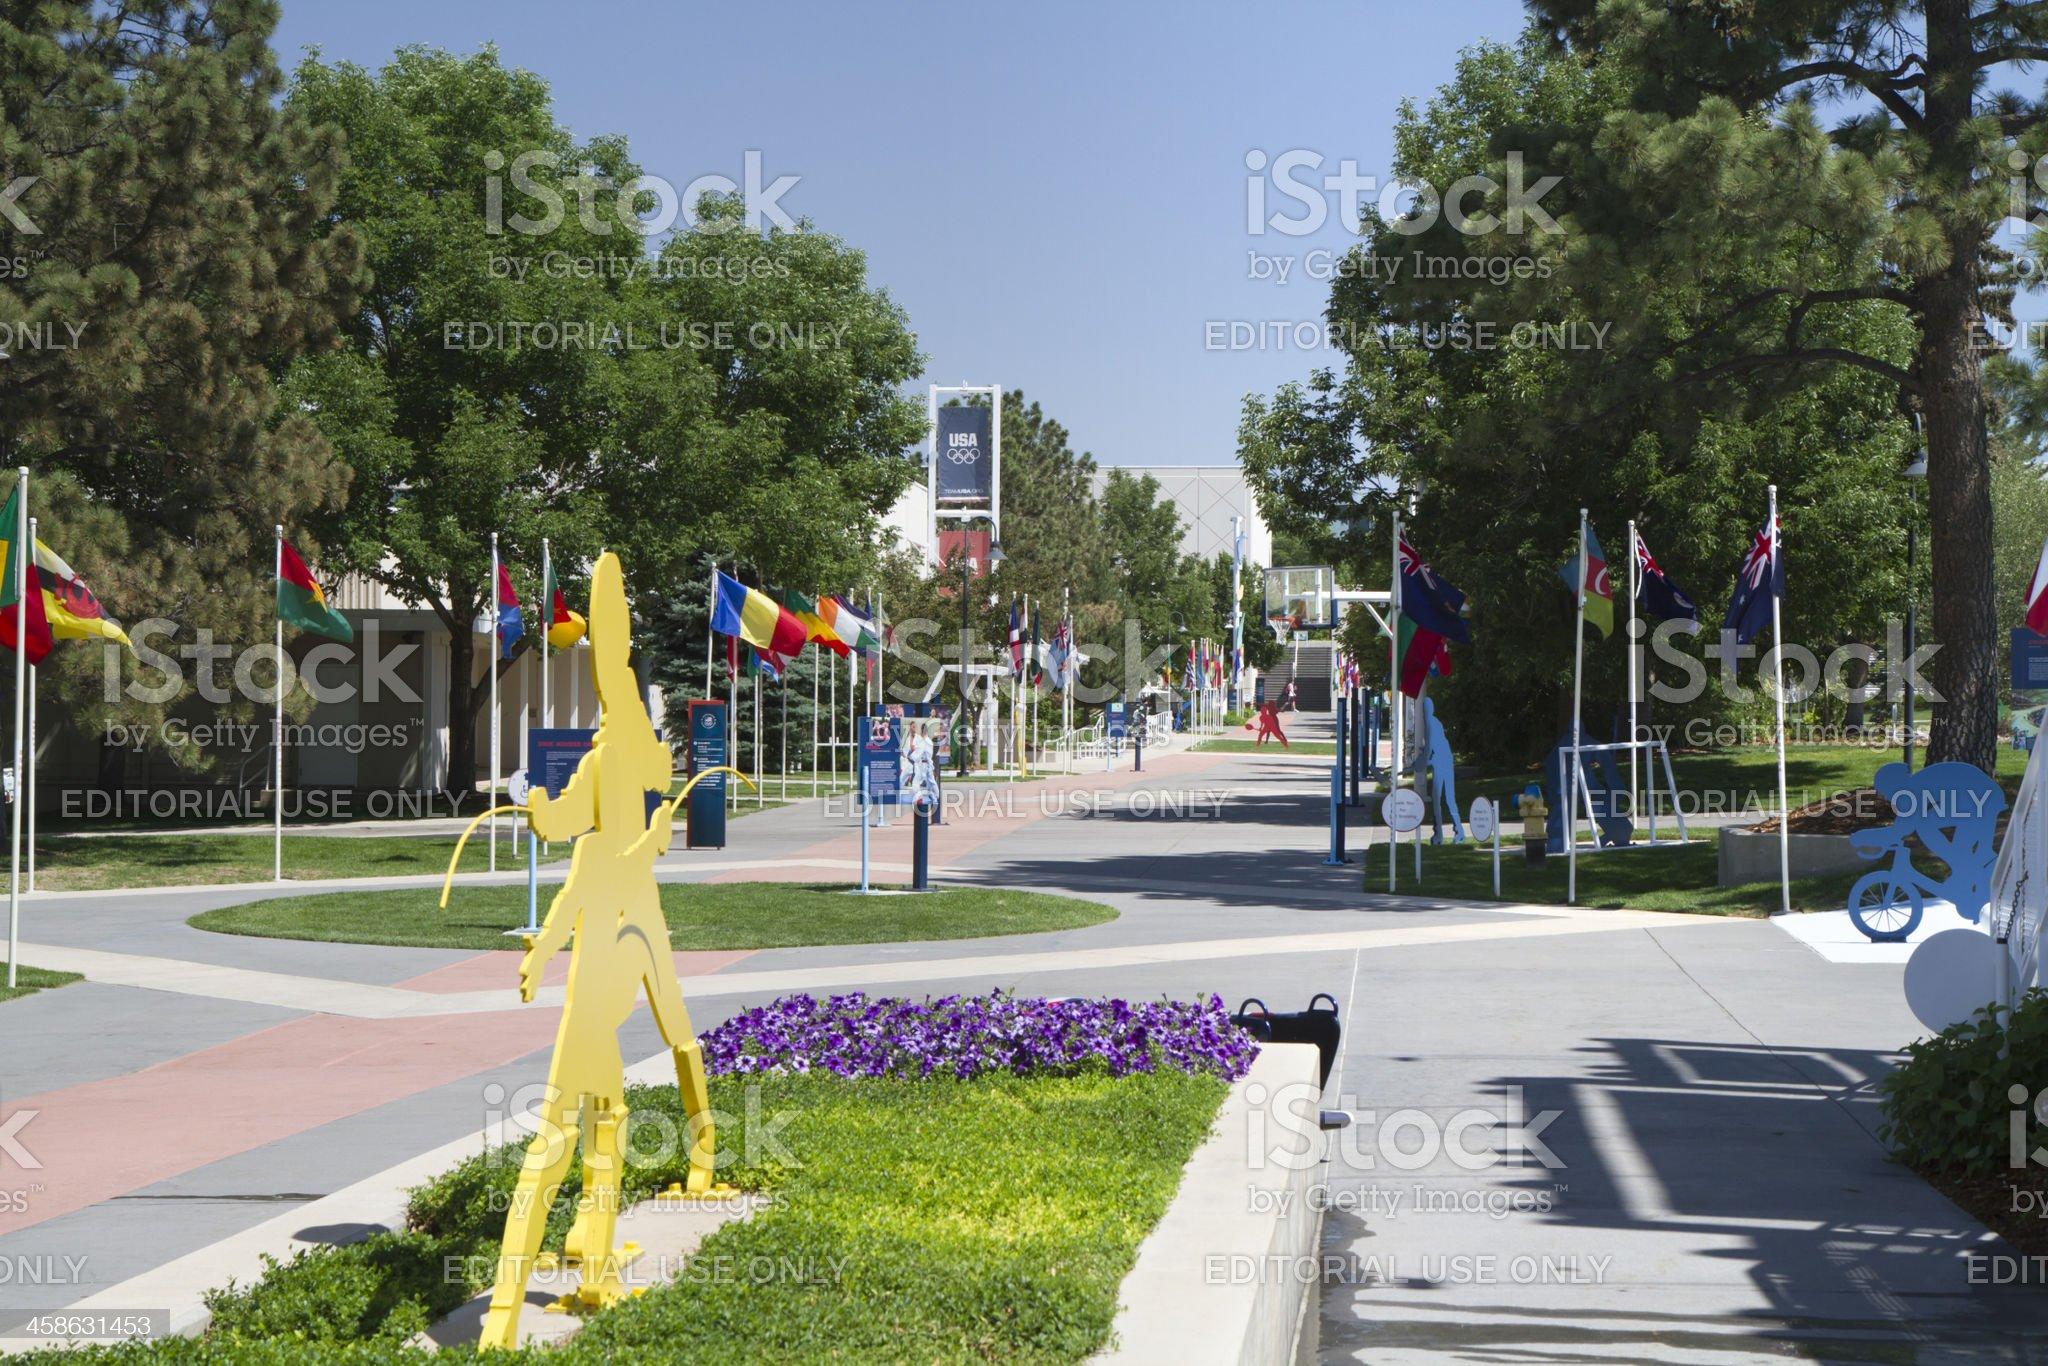 U.S. Olympic Training Center Grounds royalty-free stock photo